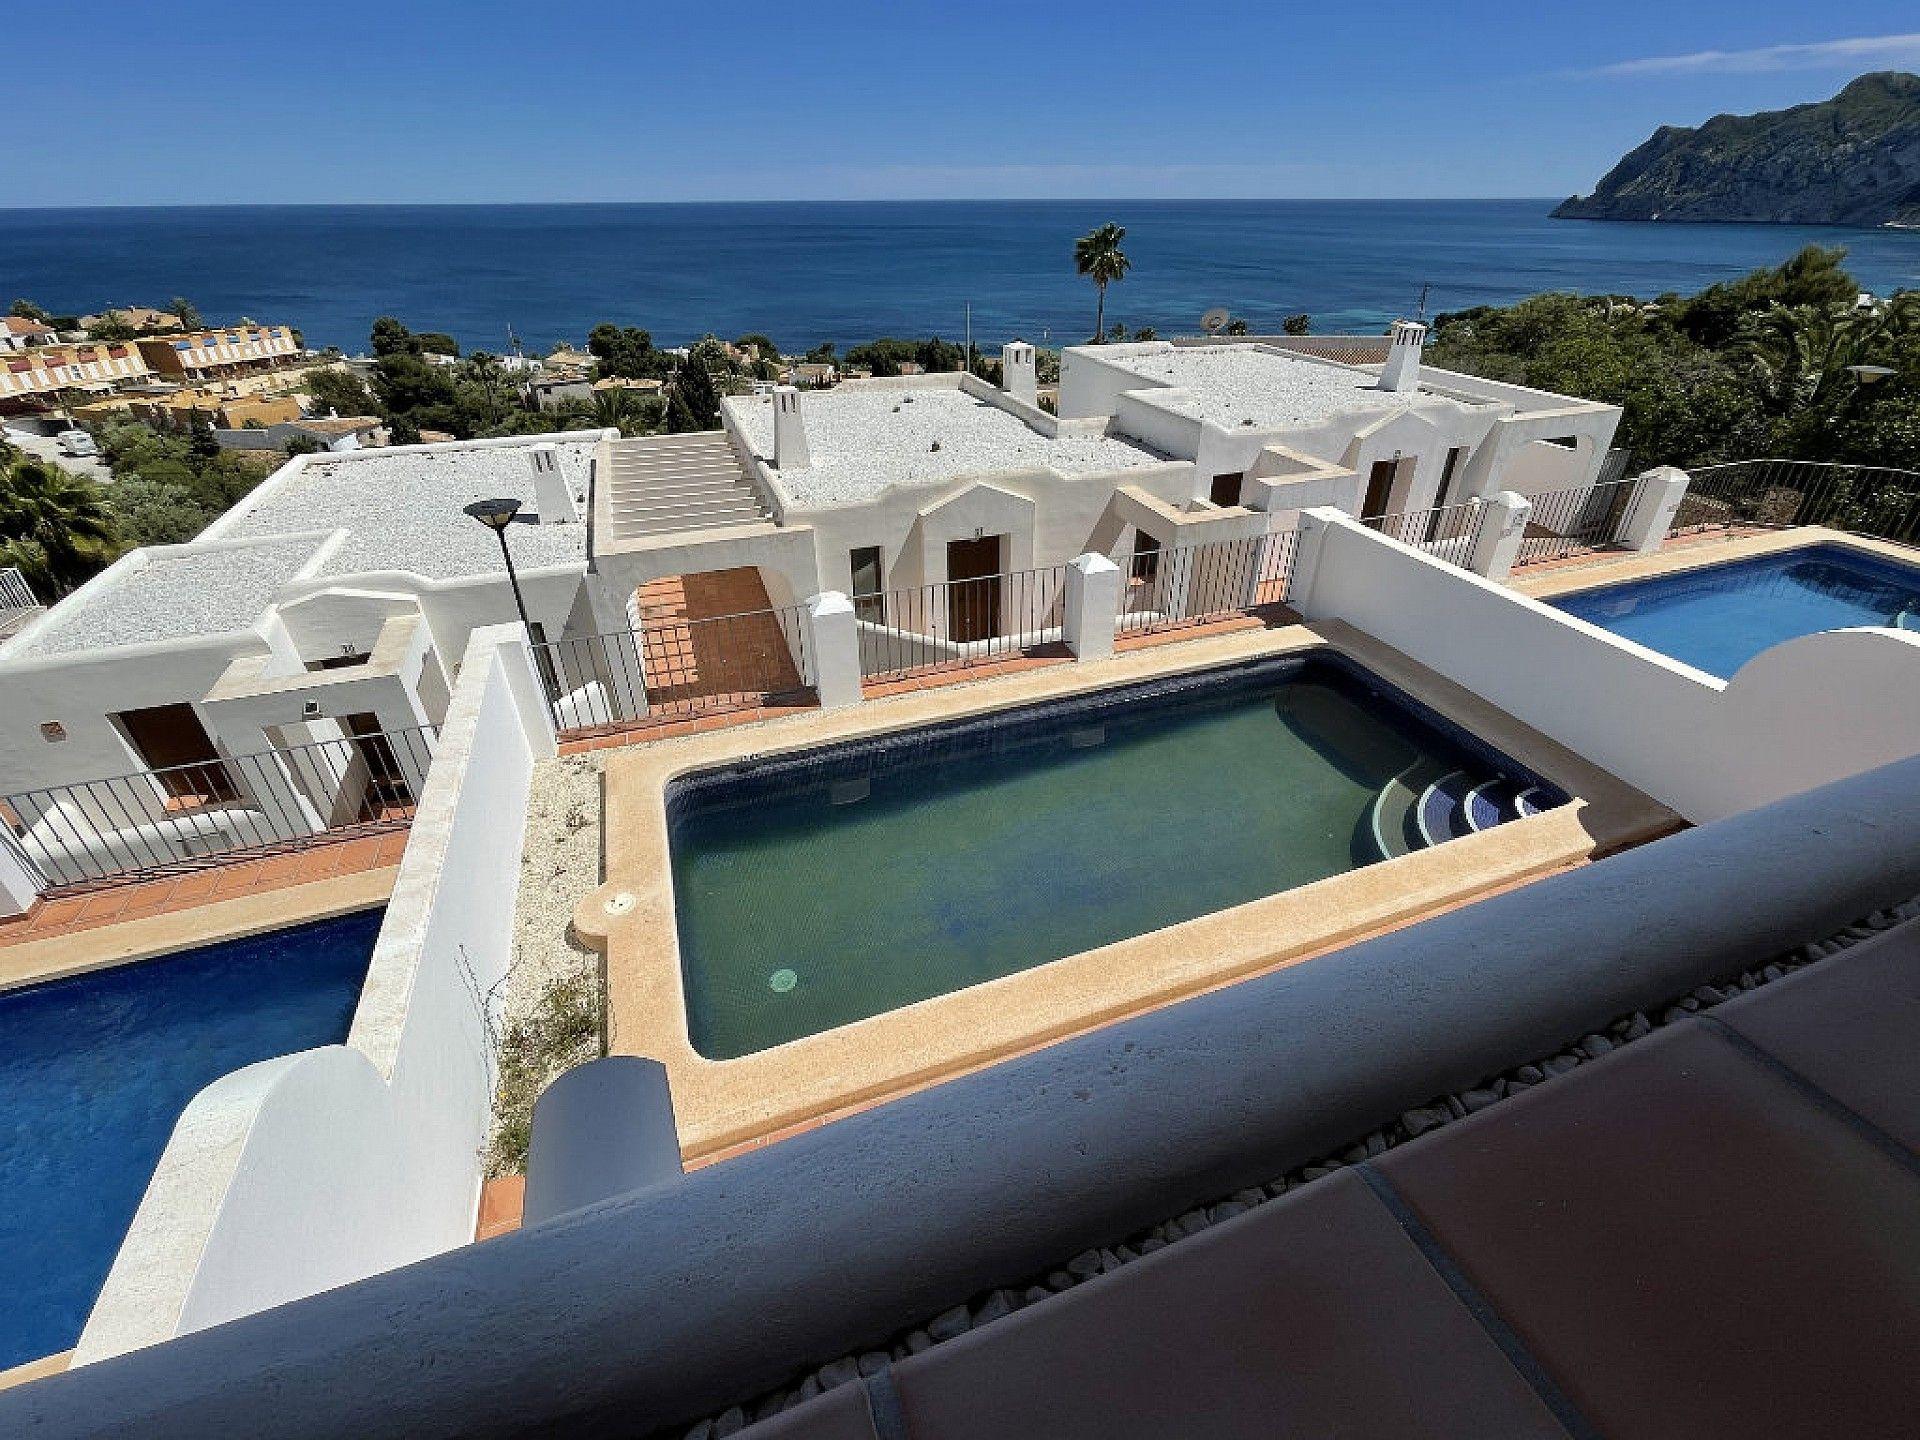 w_huis-tekoop-ibizastyle-calpe-benissa-costa-blanca-spanje-h4002-011-3.jpg